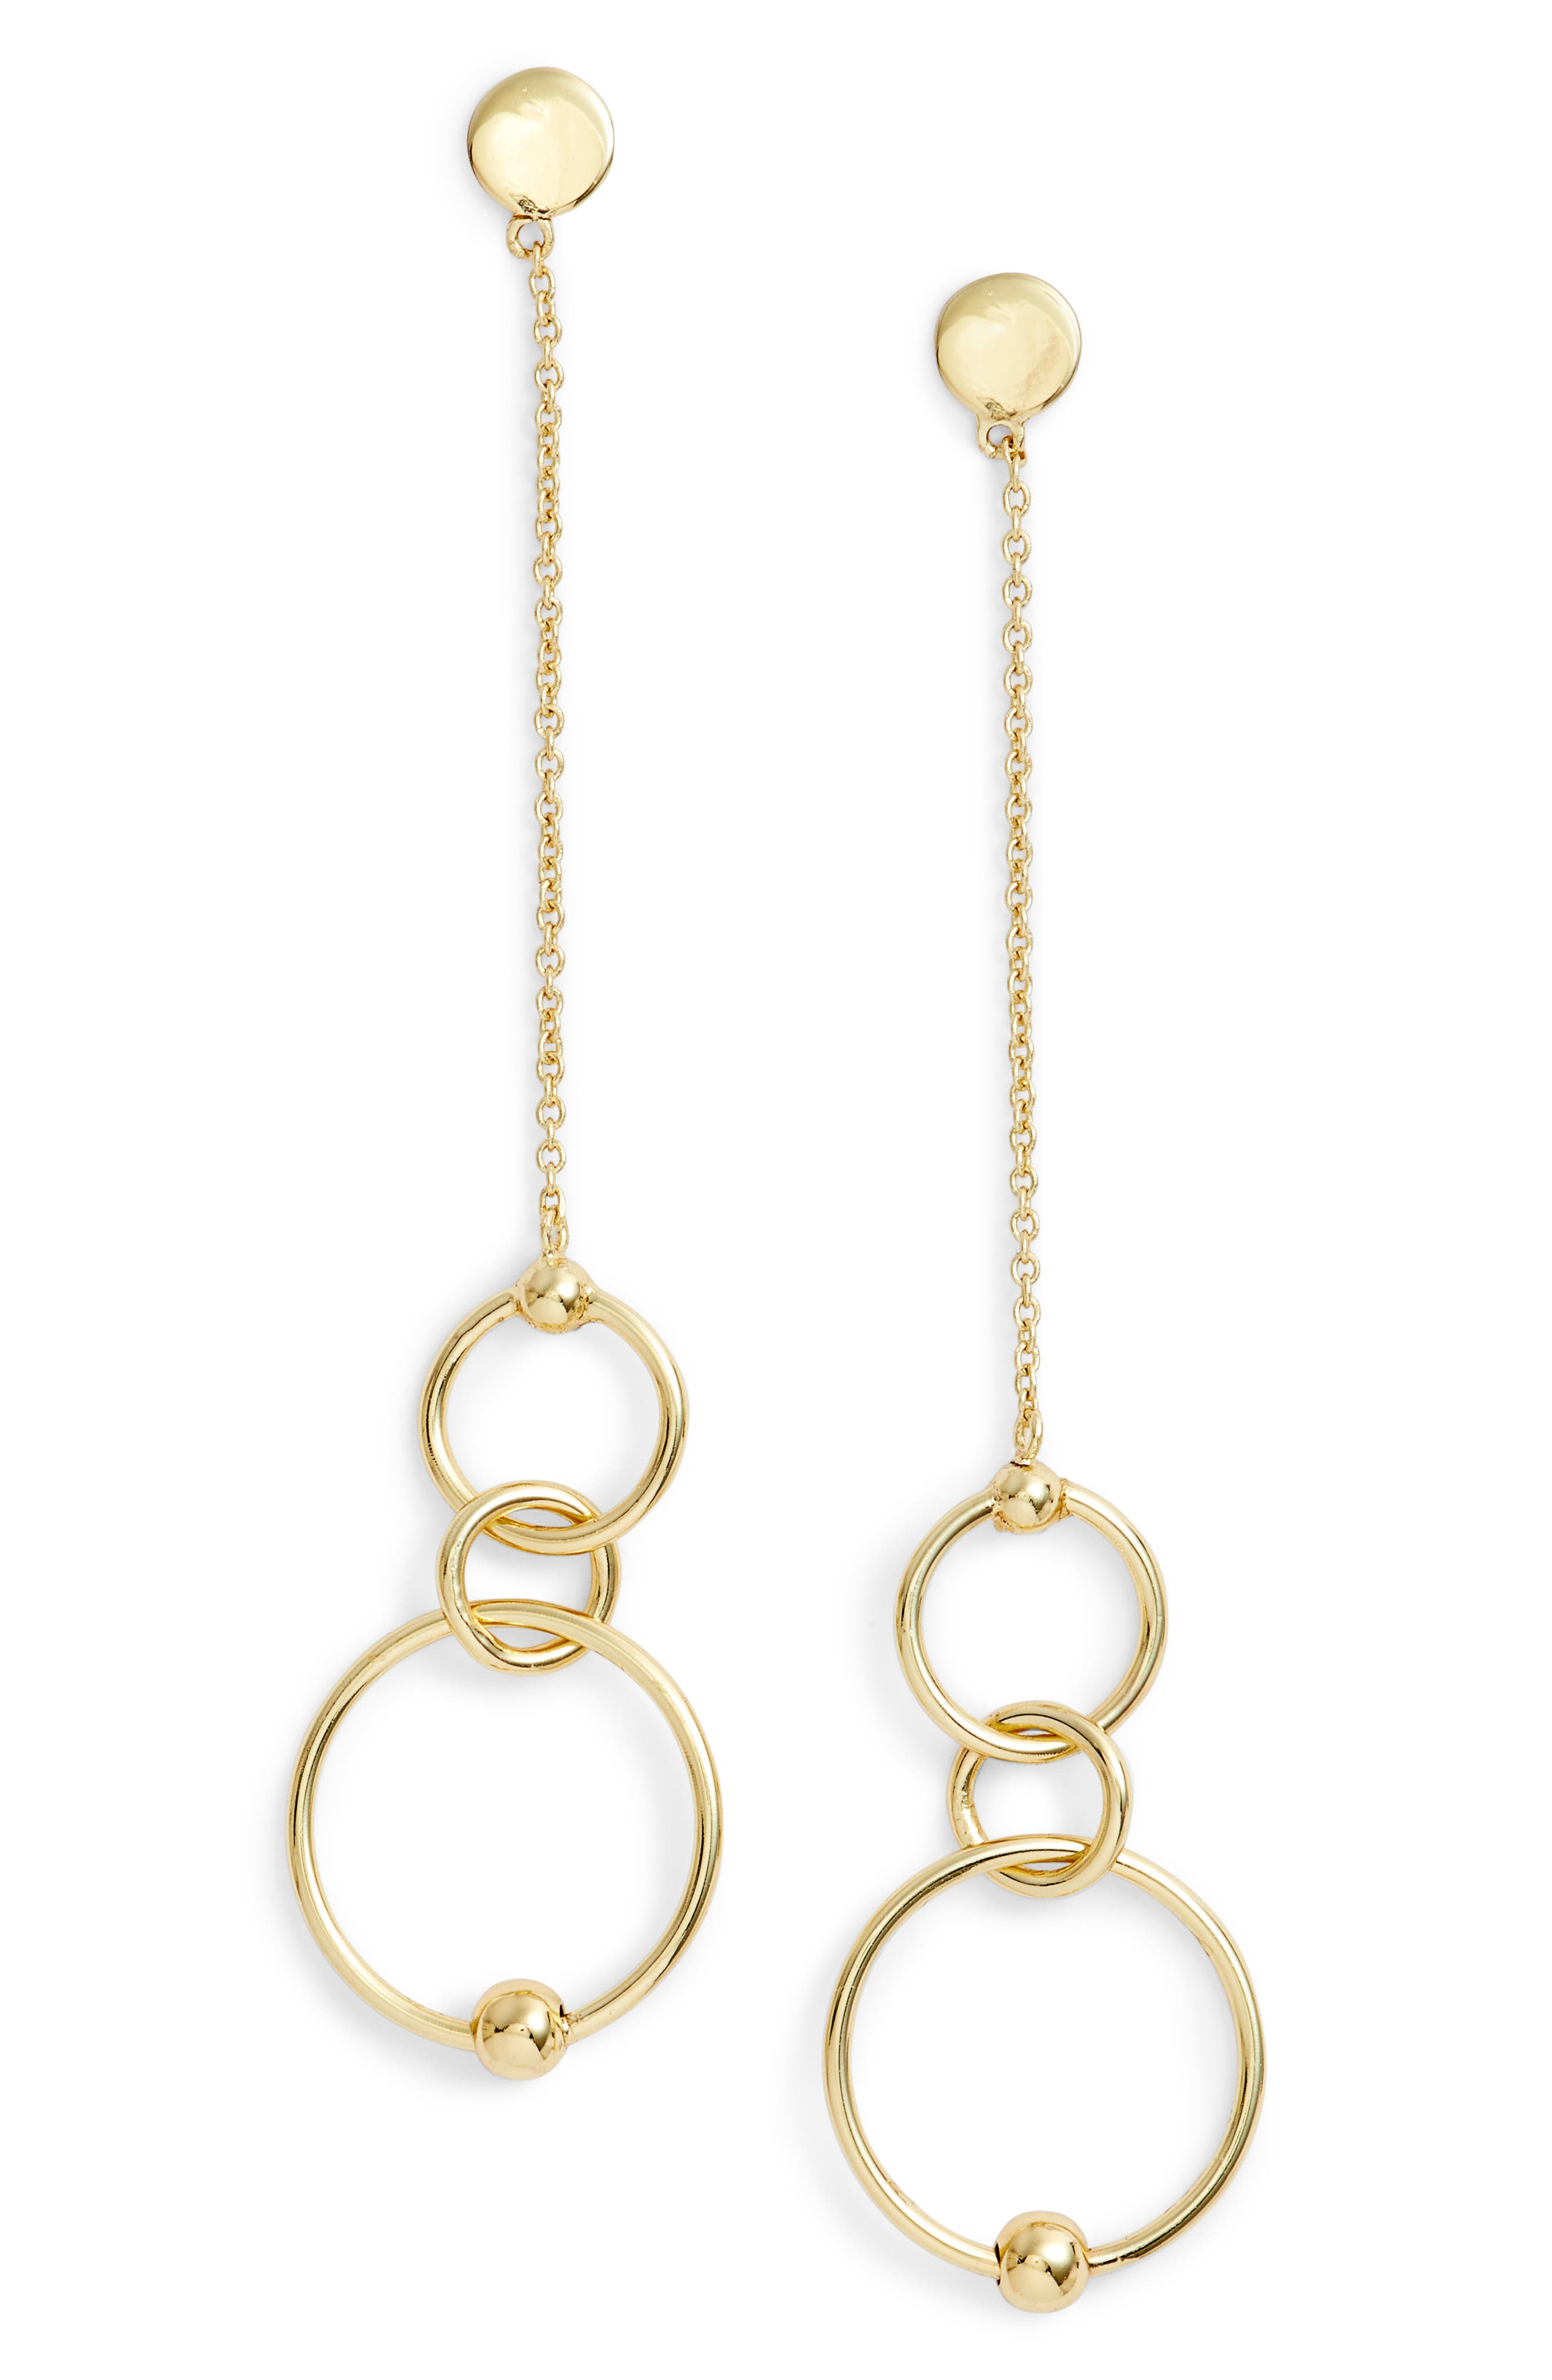 Linear Open Ring Drop Earrings,                             Main thumbnail 1, color,                             Gold